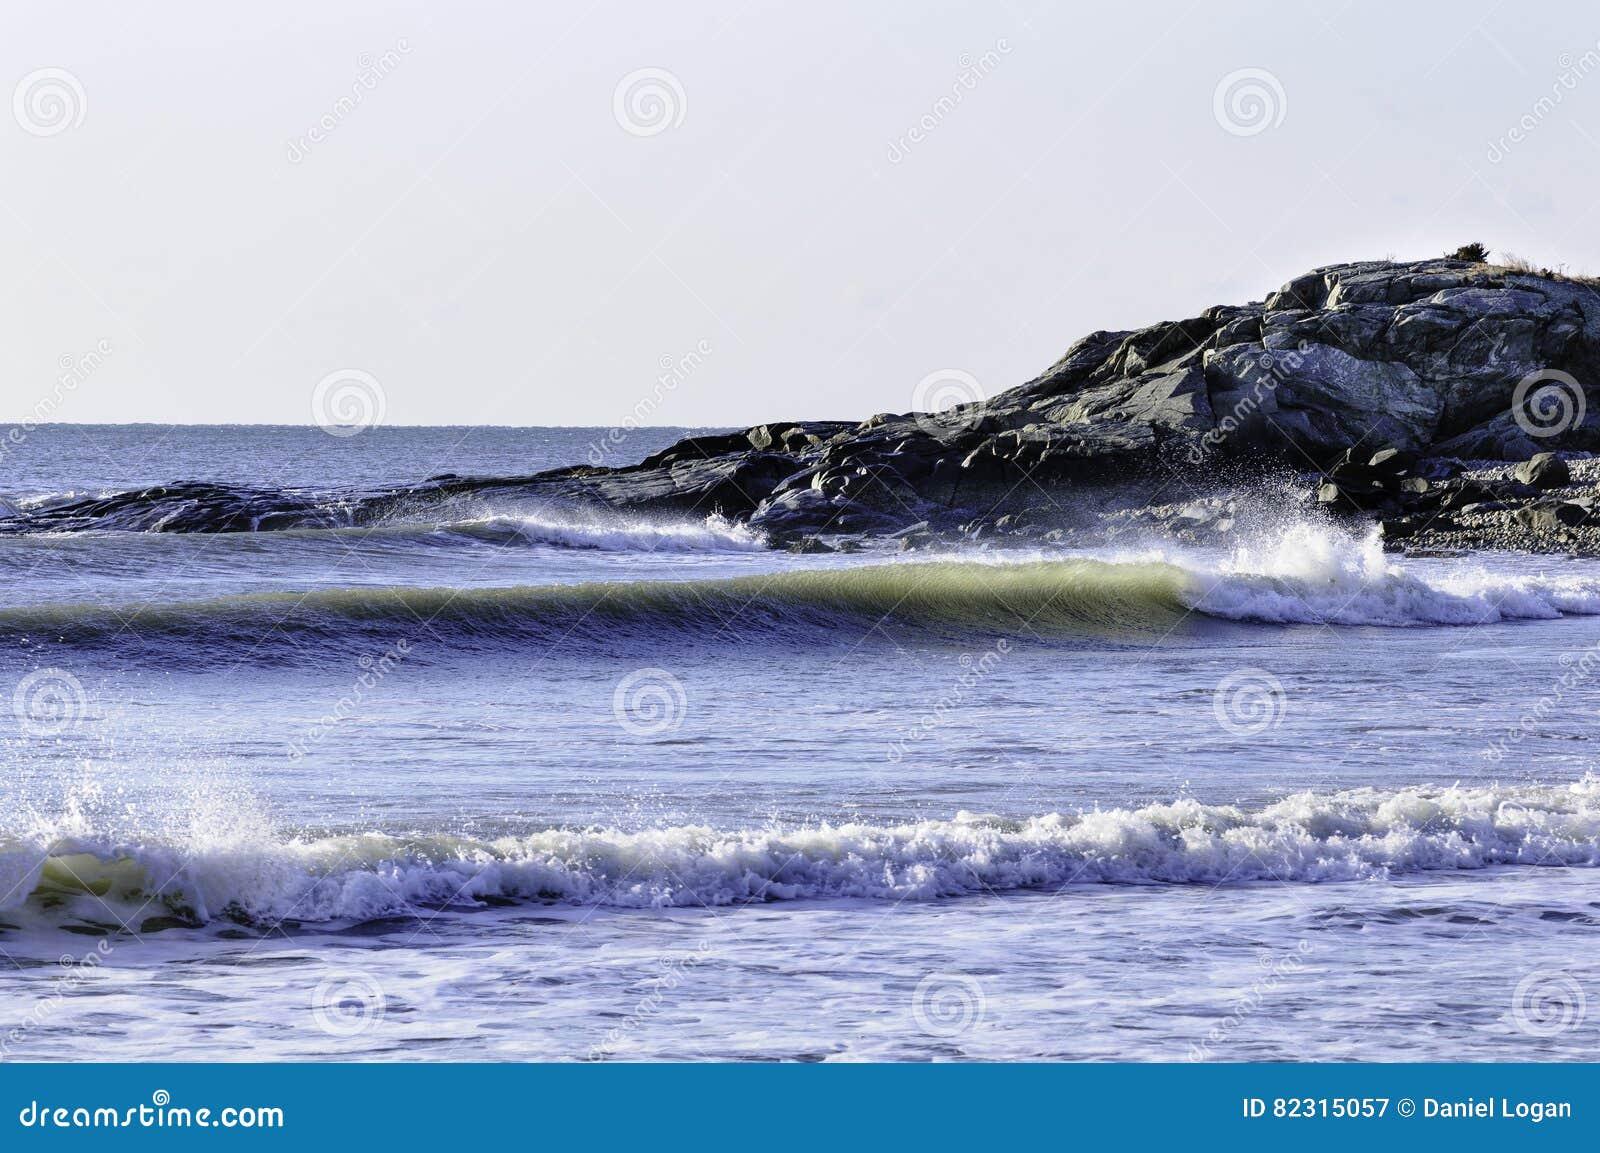 Surf in Buzzards Bay